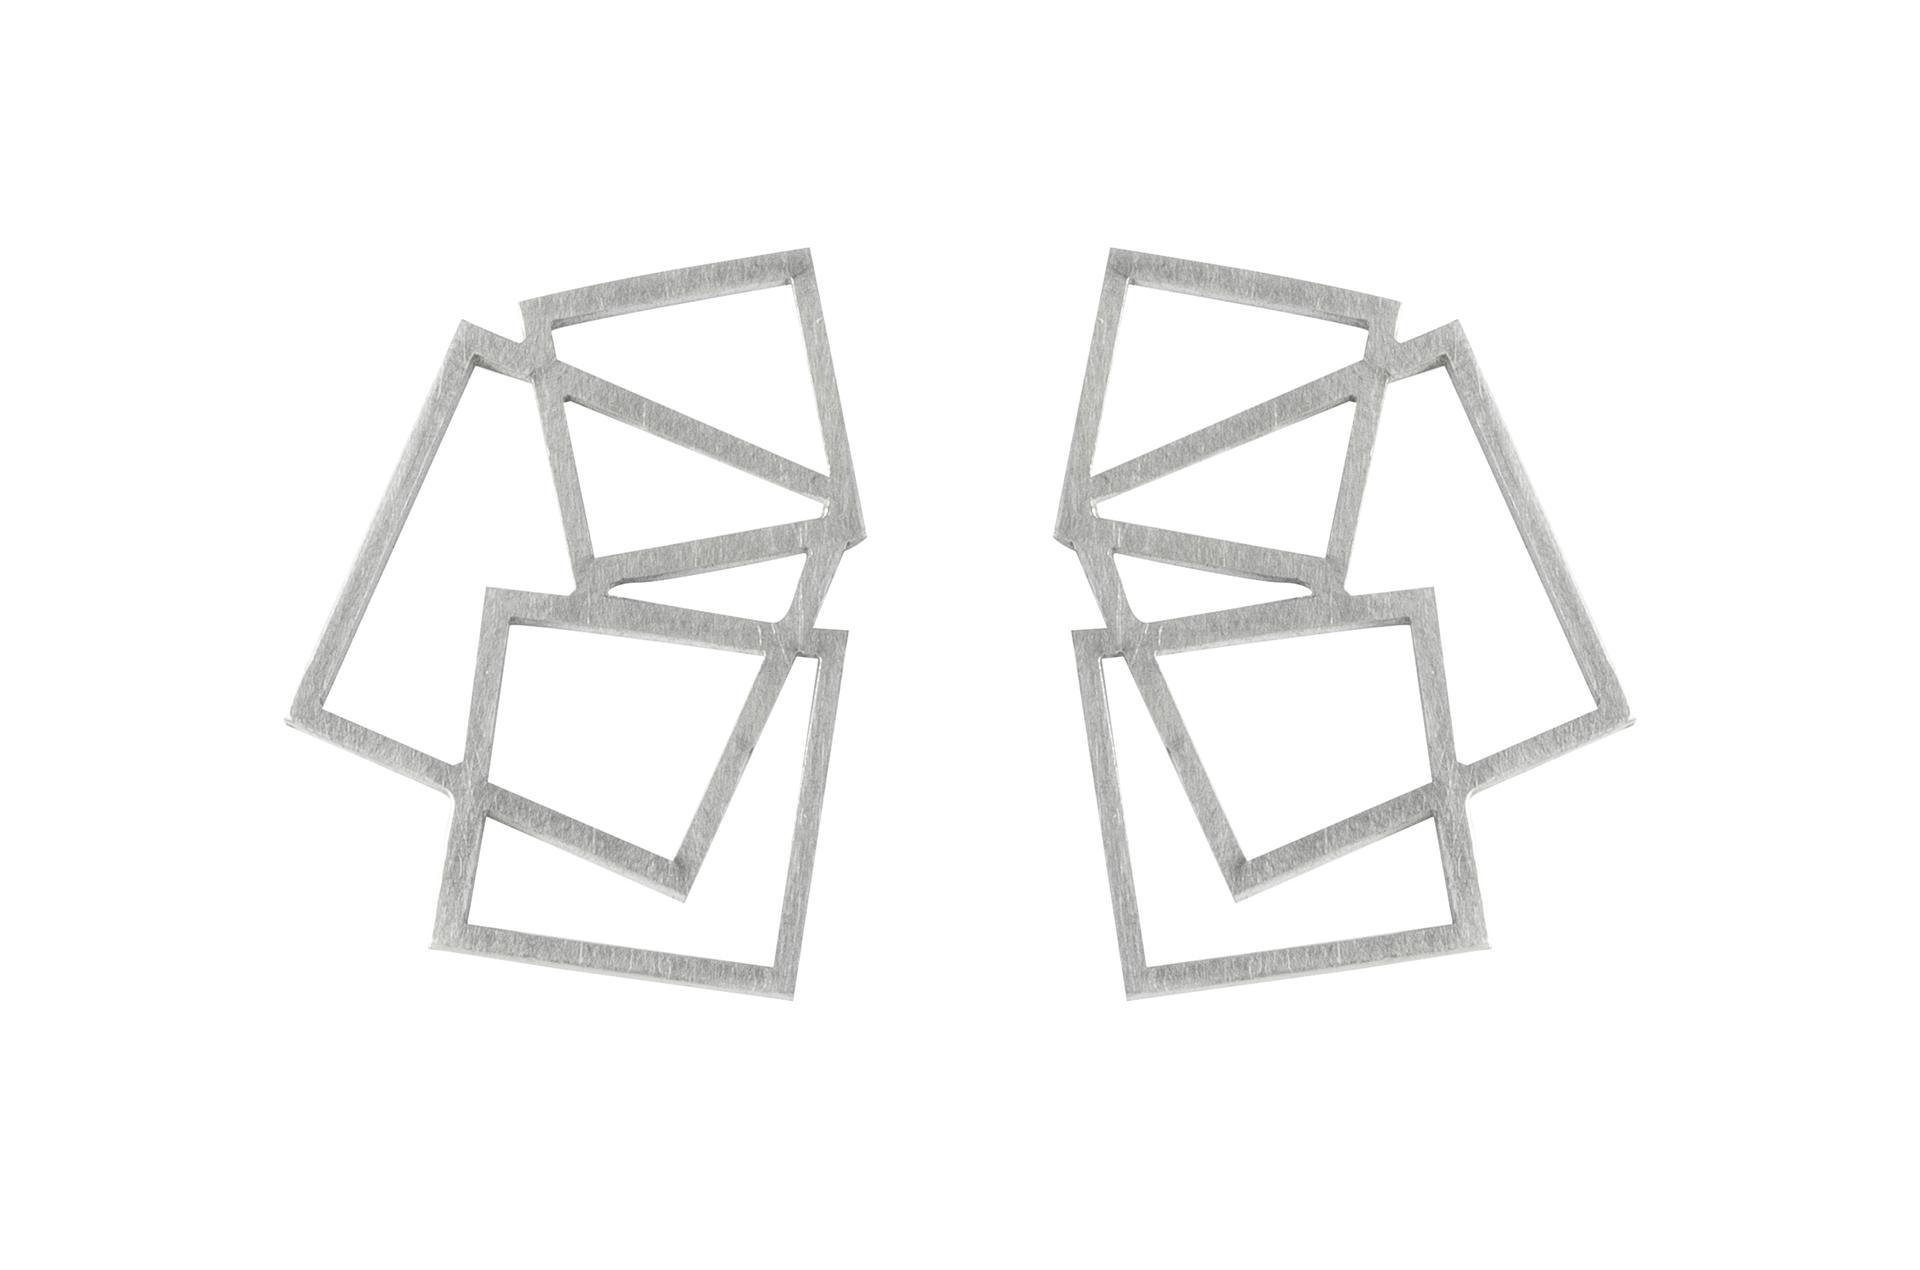 Square Disarray Studs